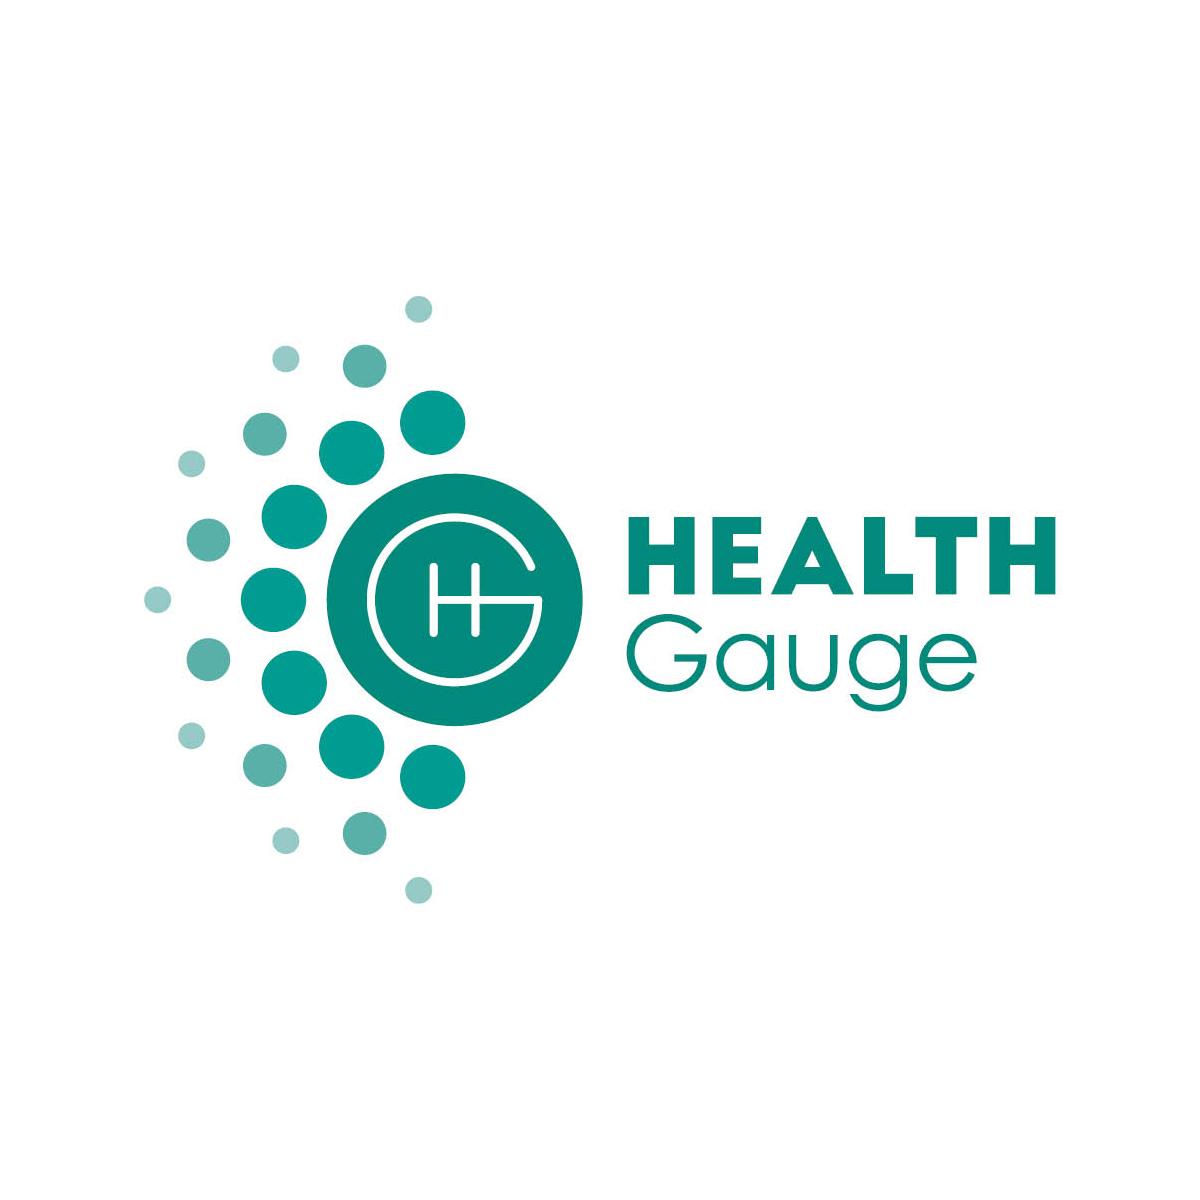 Health Gauge Logo